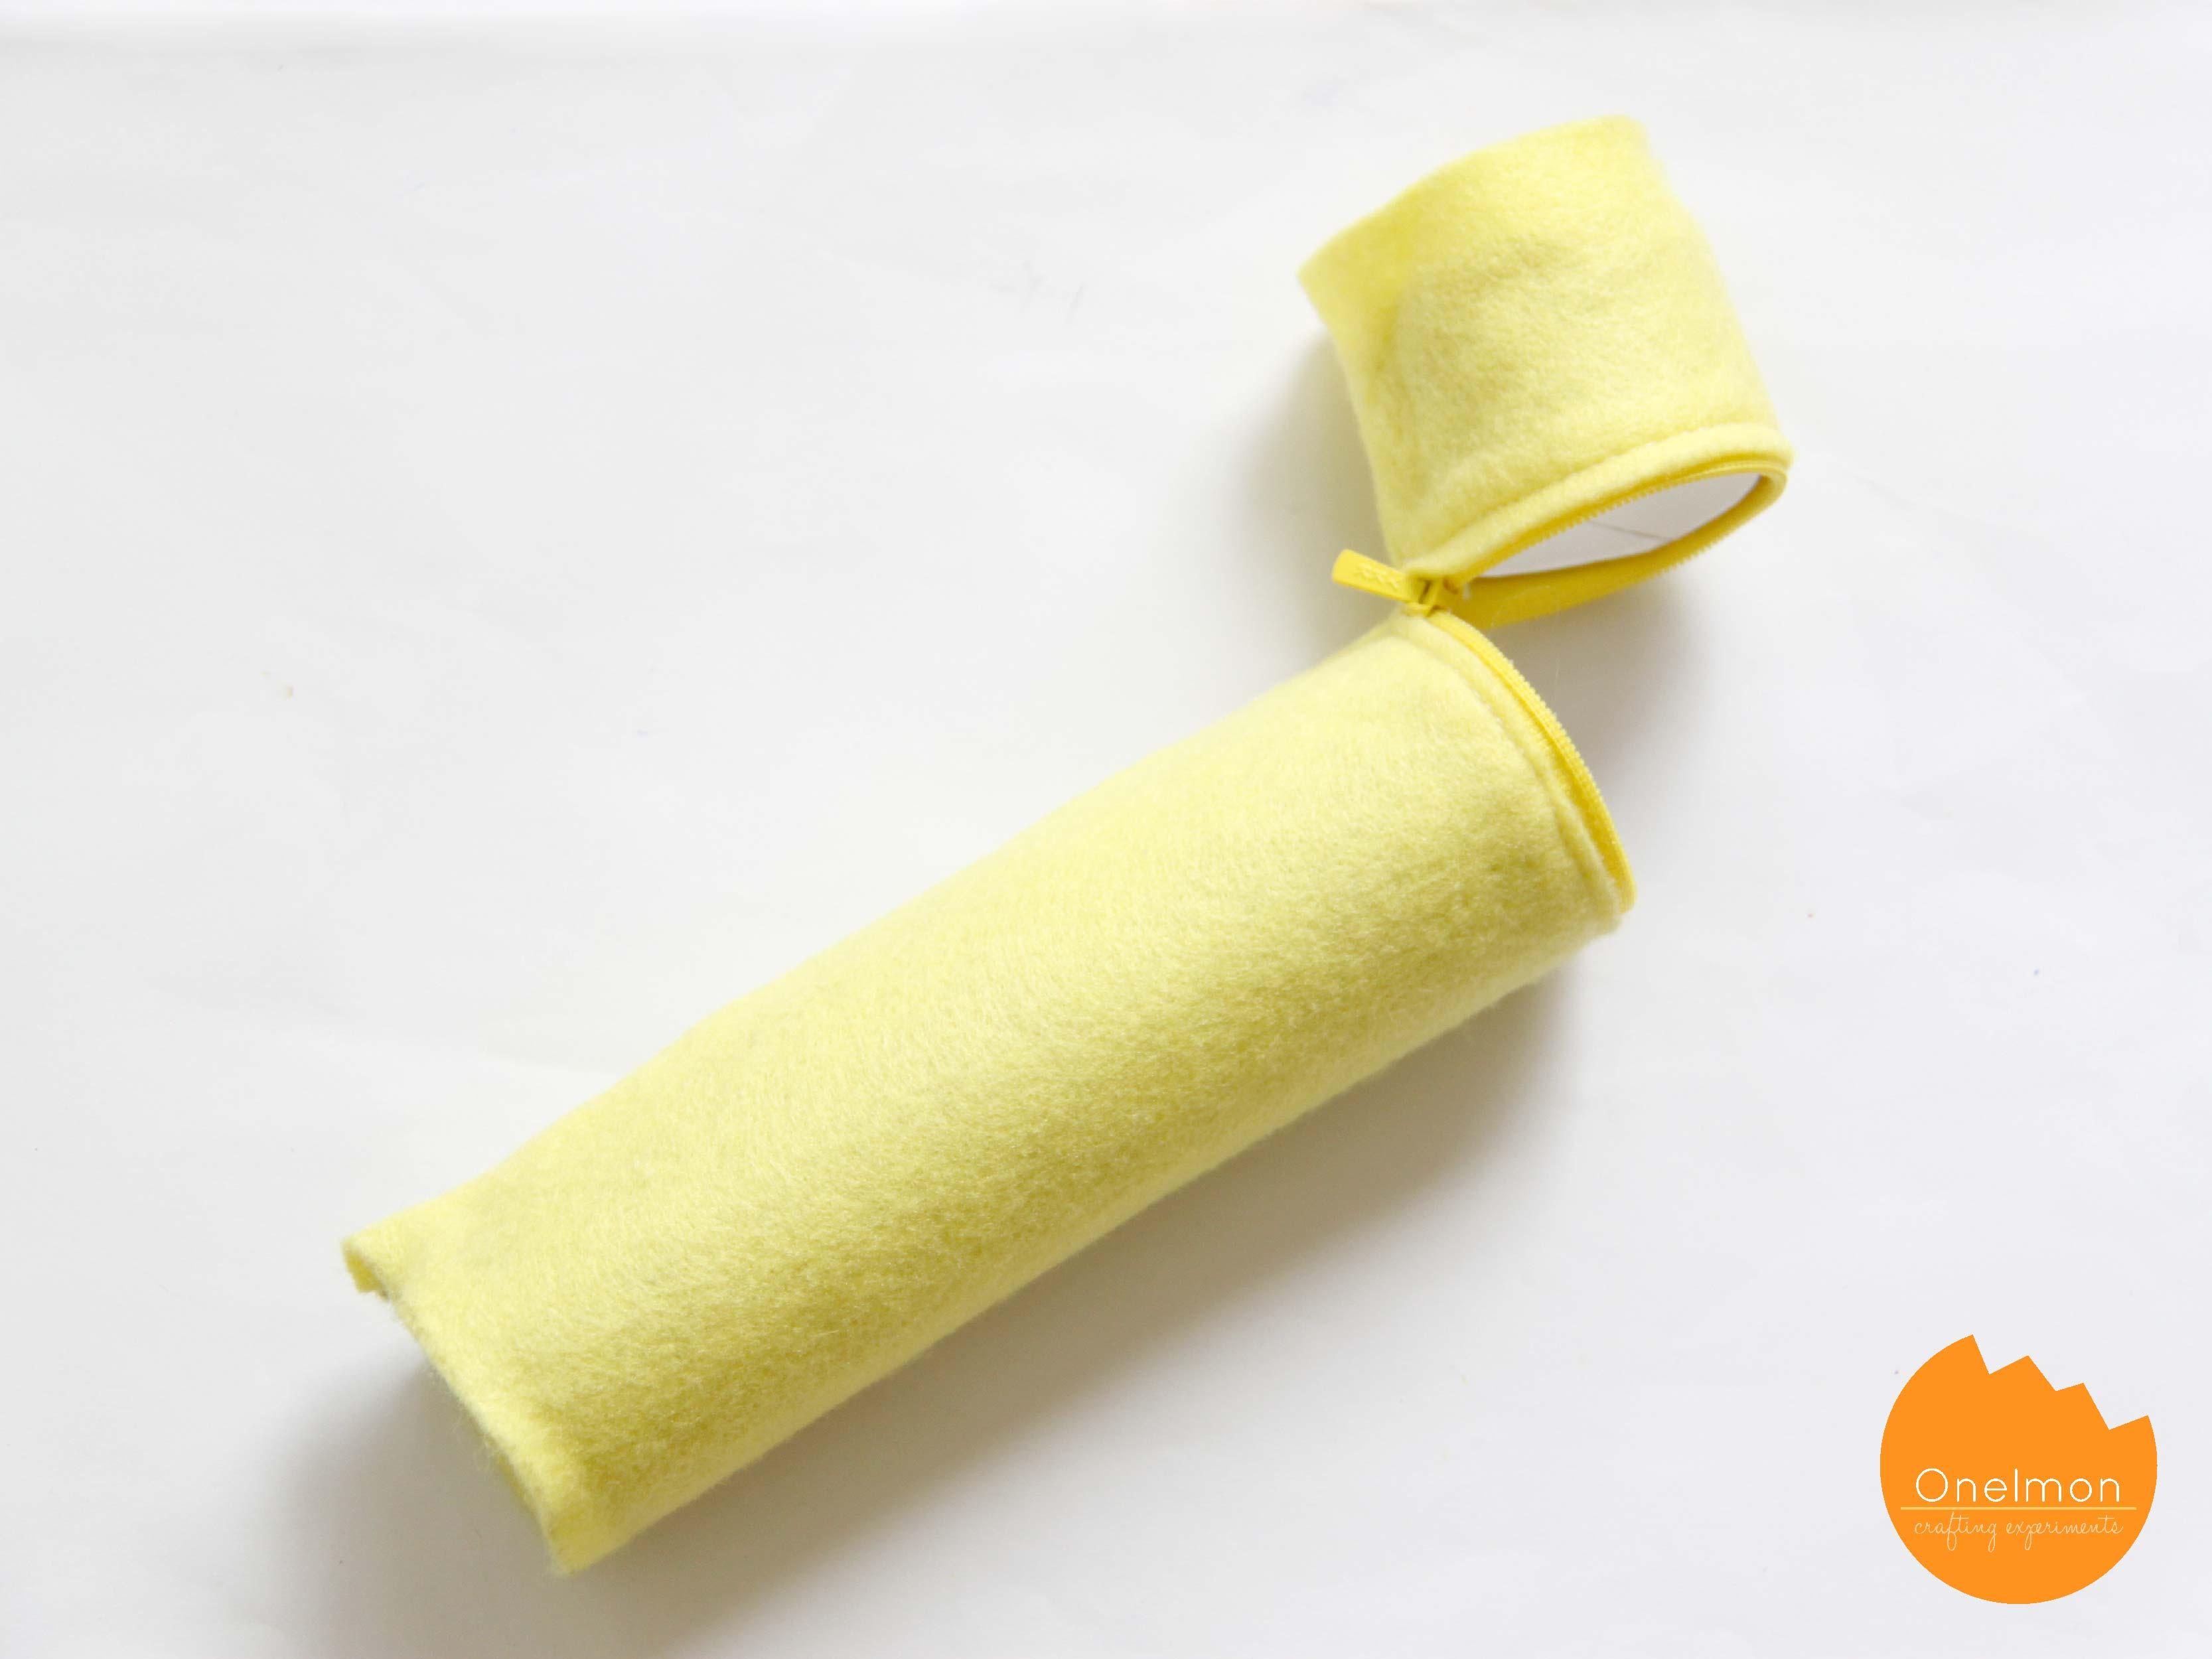 DIY Toilet Roll Pencil Case with Felt | onelmon